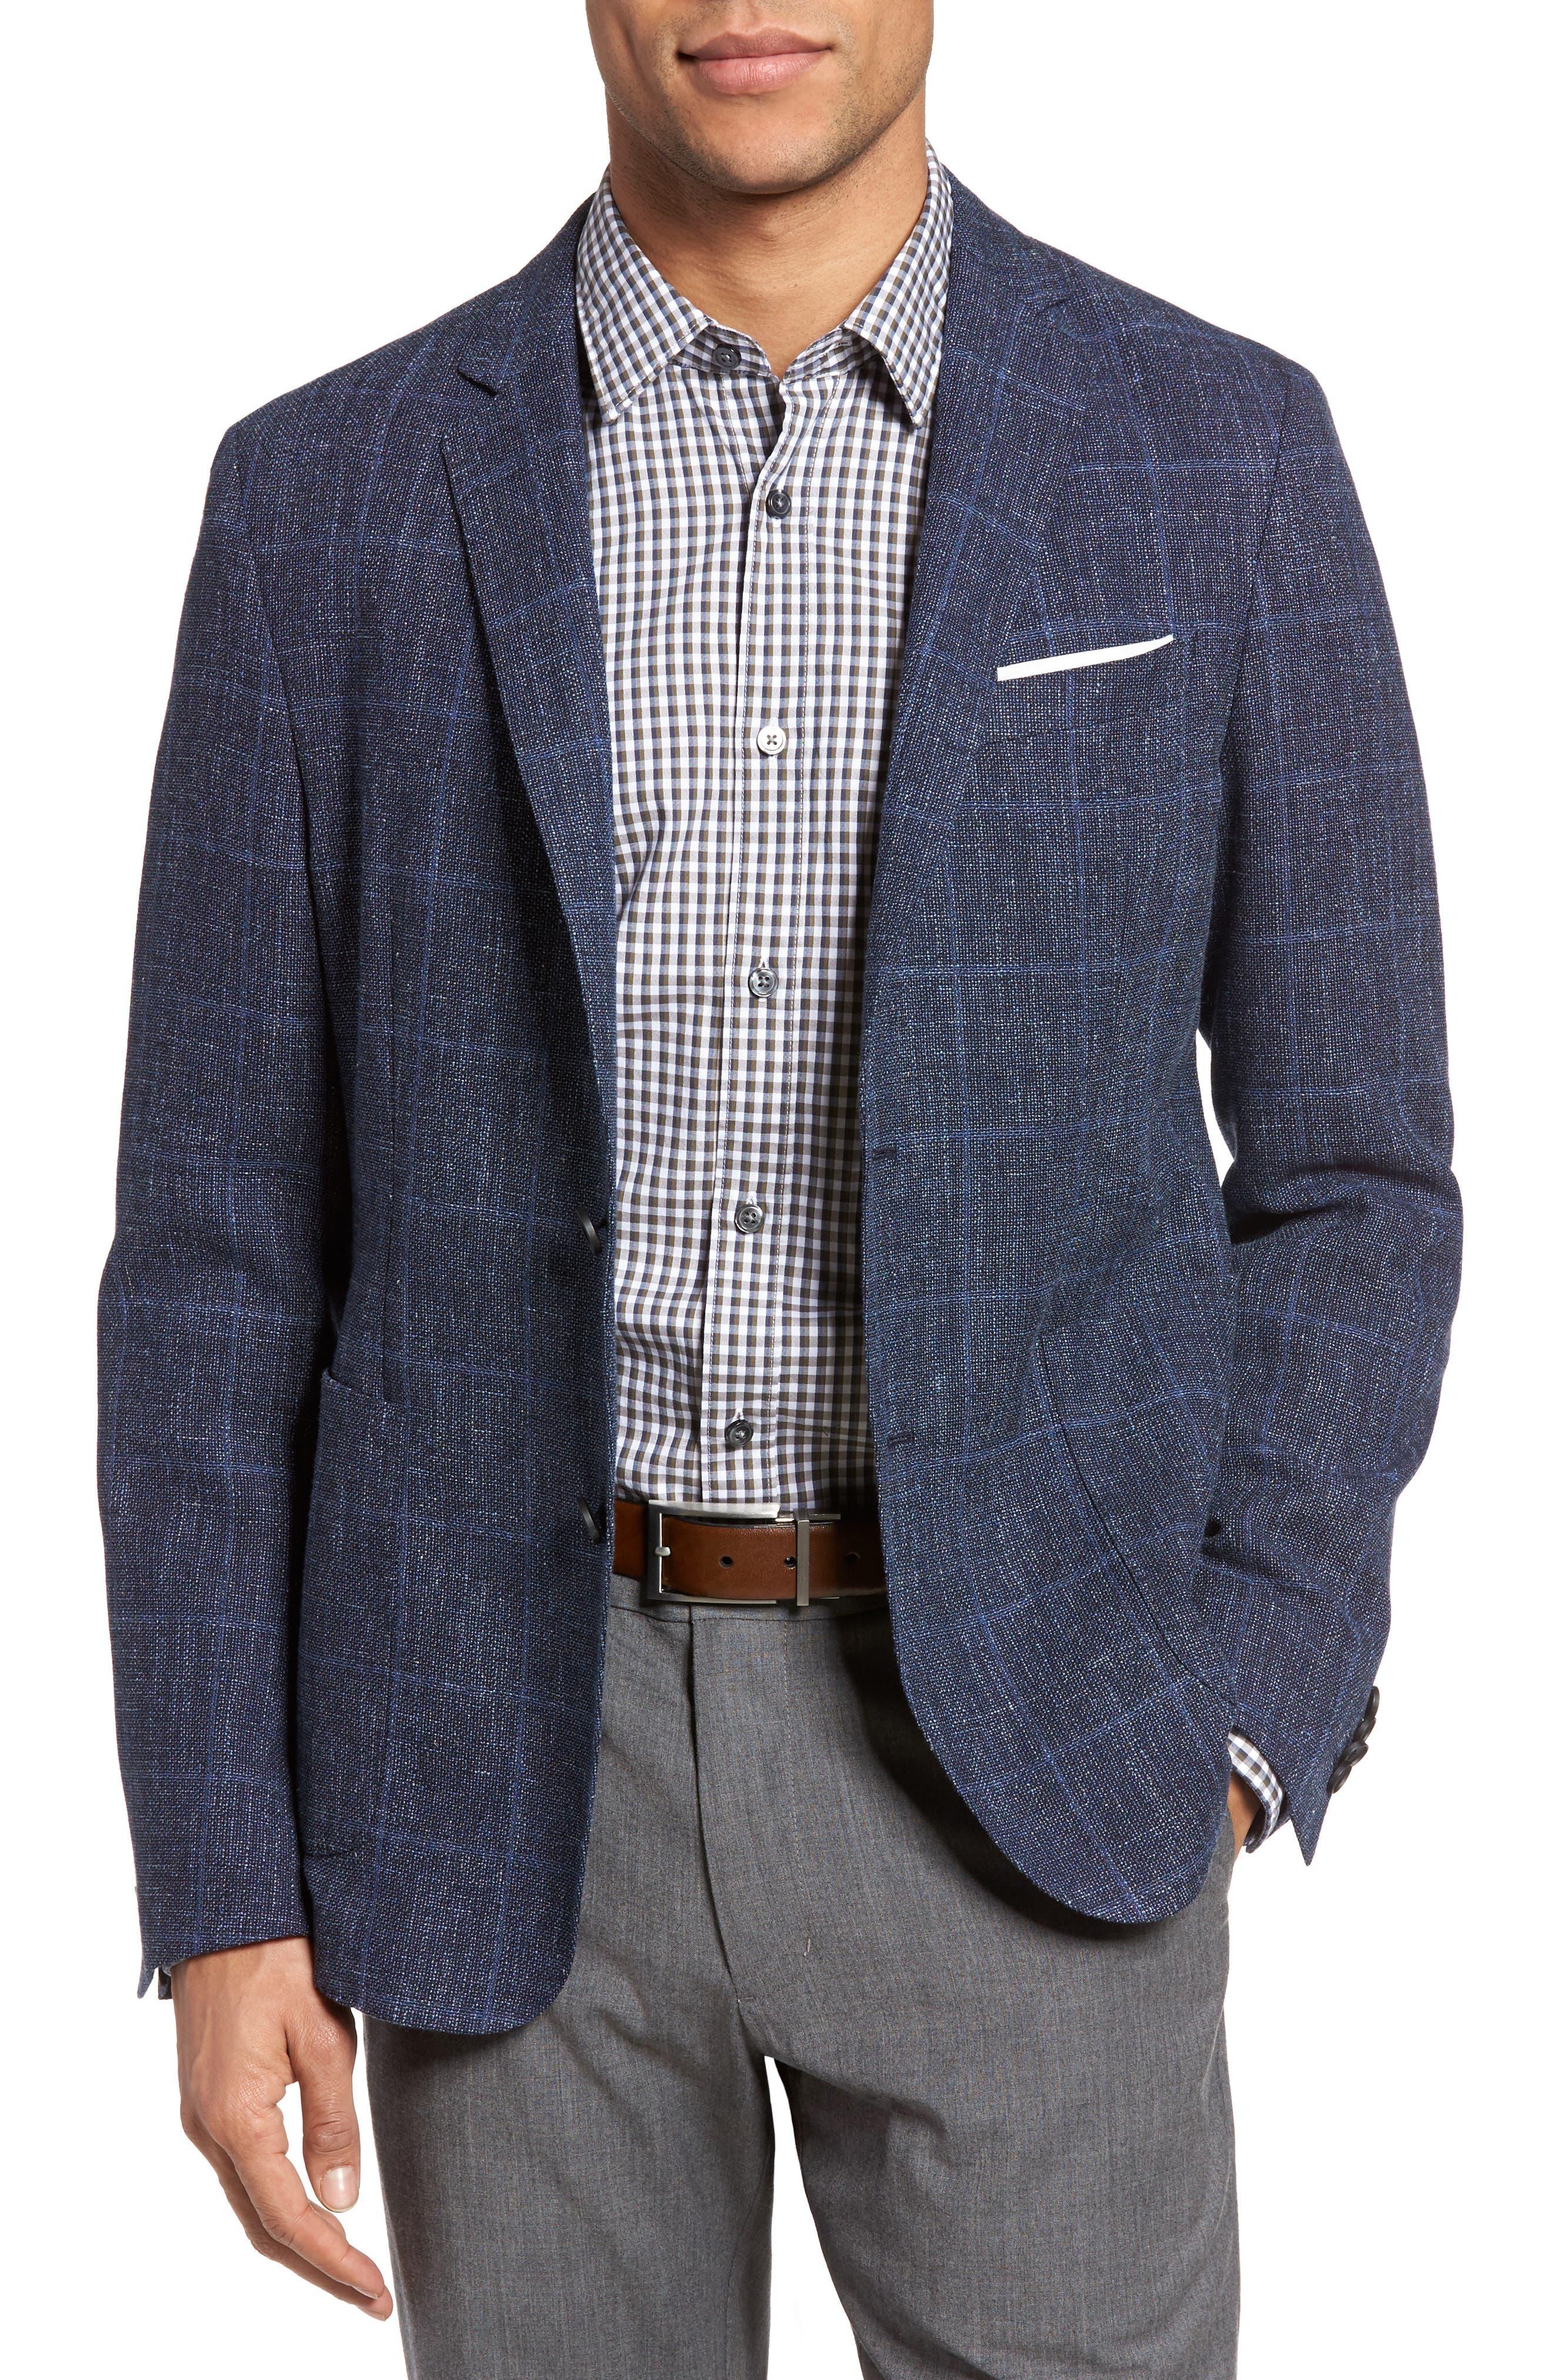 Alternate Image 1 Selected - BOSS Nold Trim Fit Unconstructed Wool Blend Sport Coat